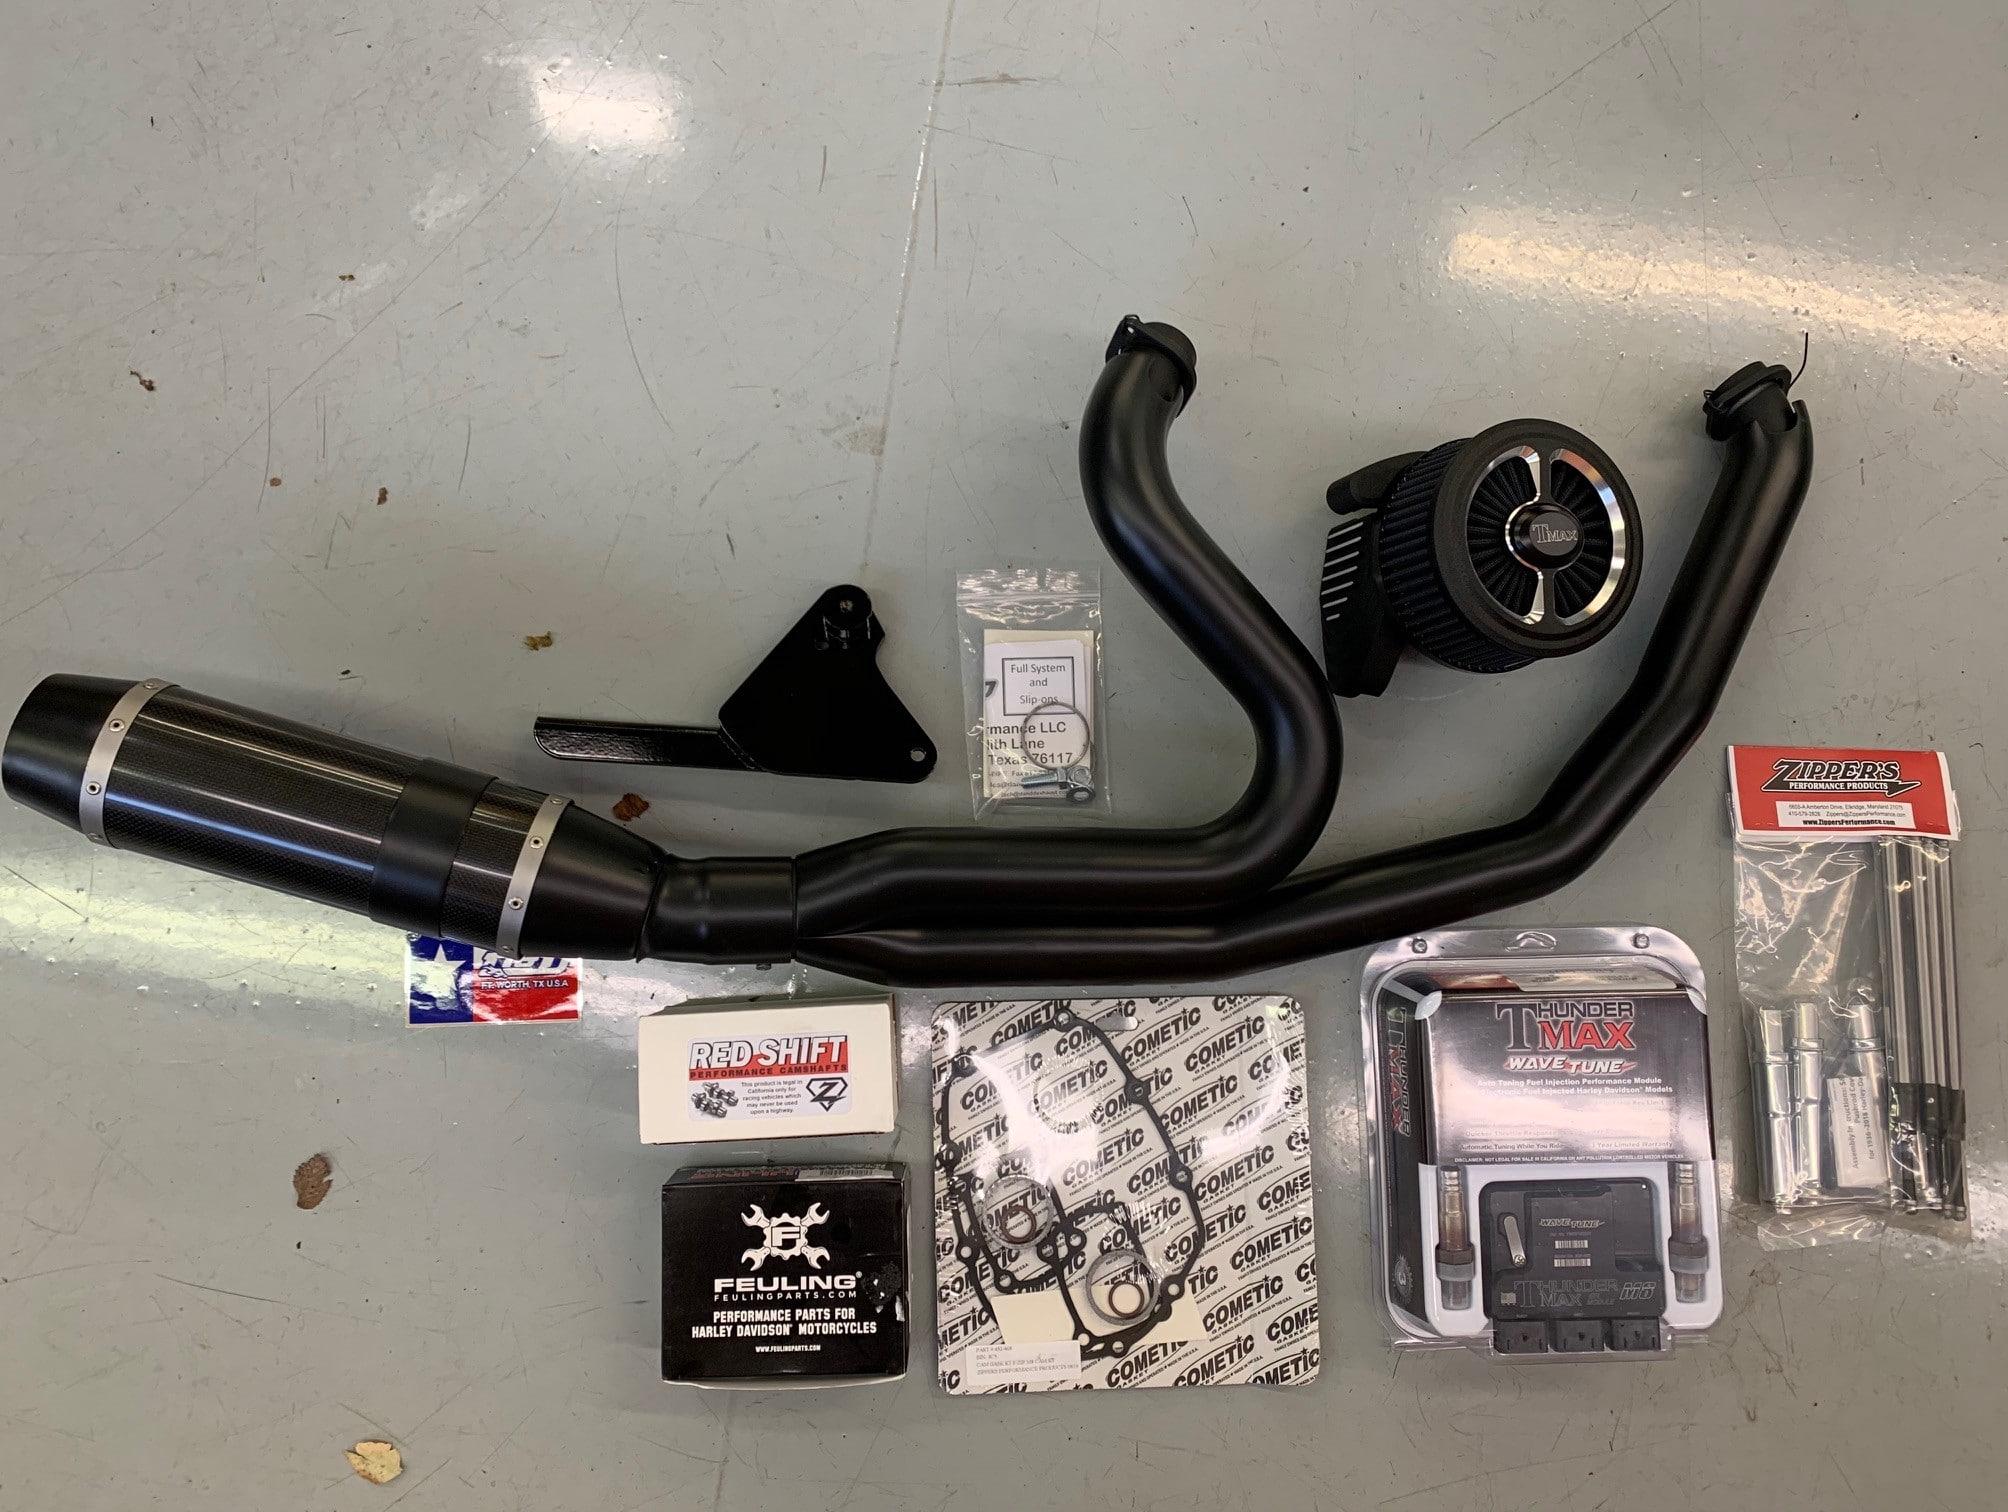 project bolt-on bike